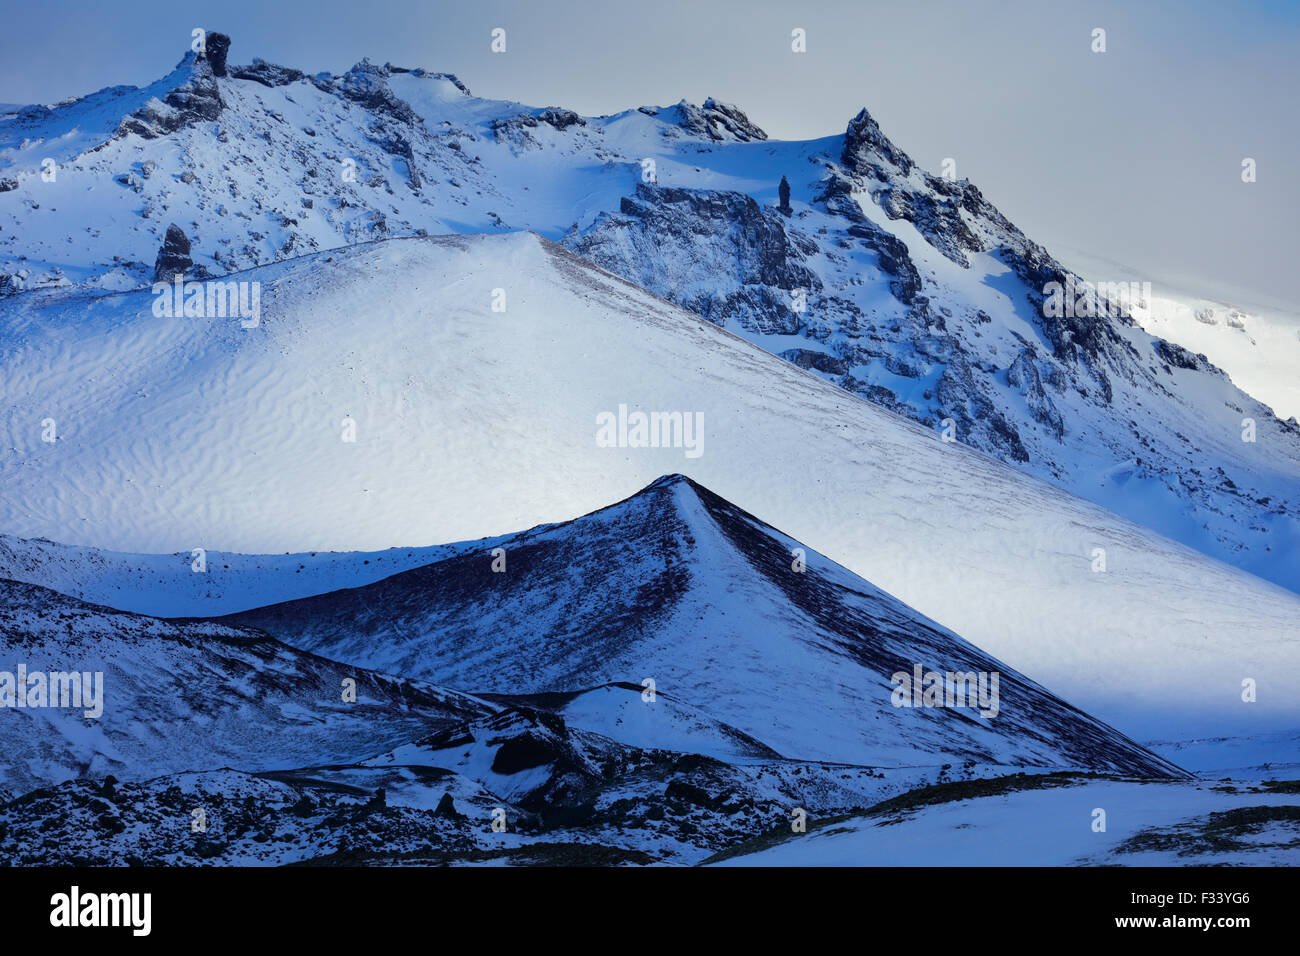 snowclad Hafrafell, Snaefellsness Peninsula, Iceland - Stock Image